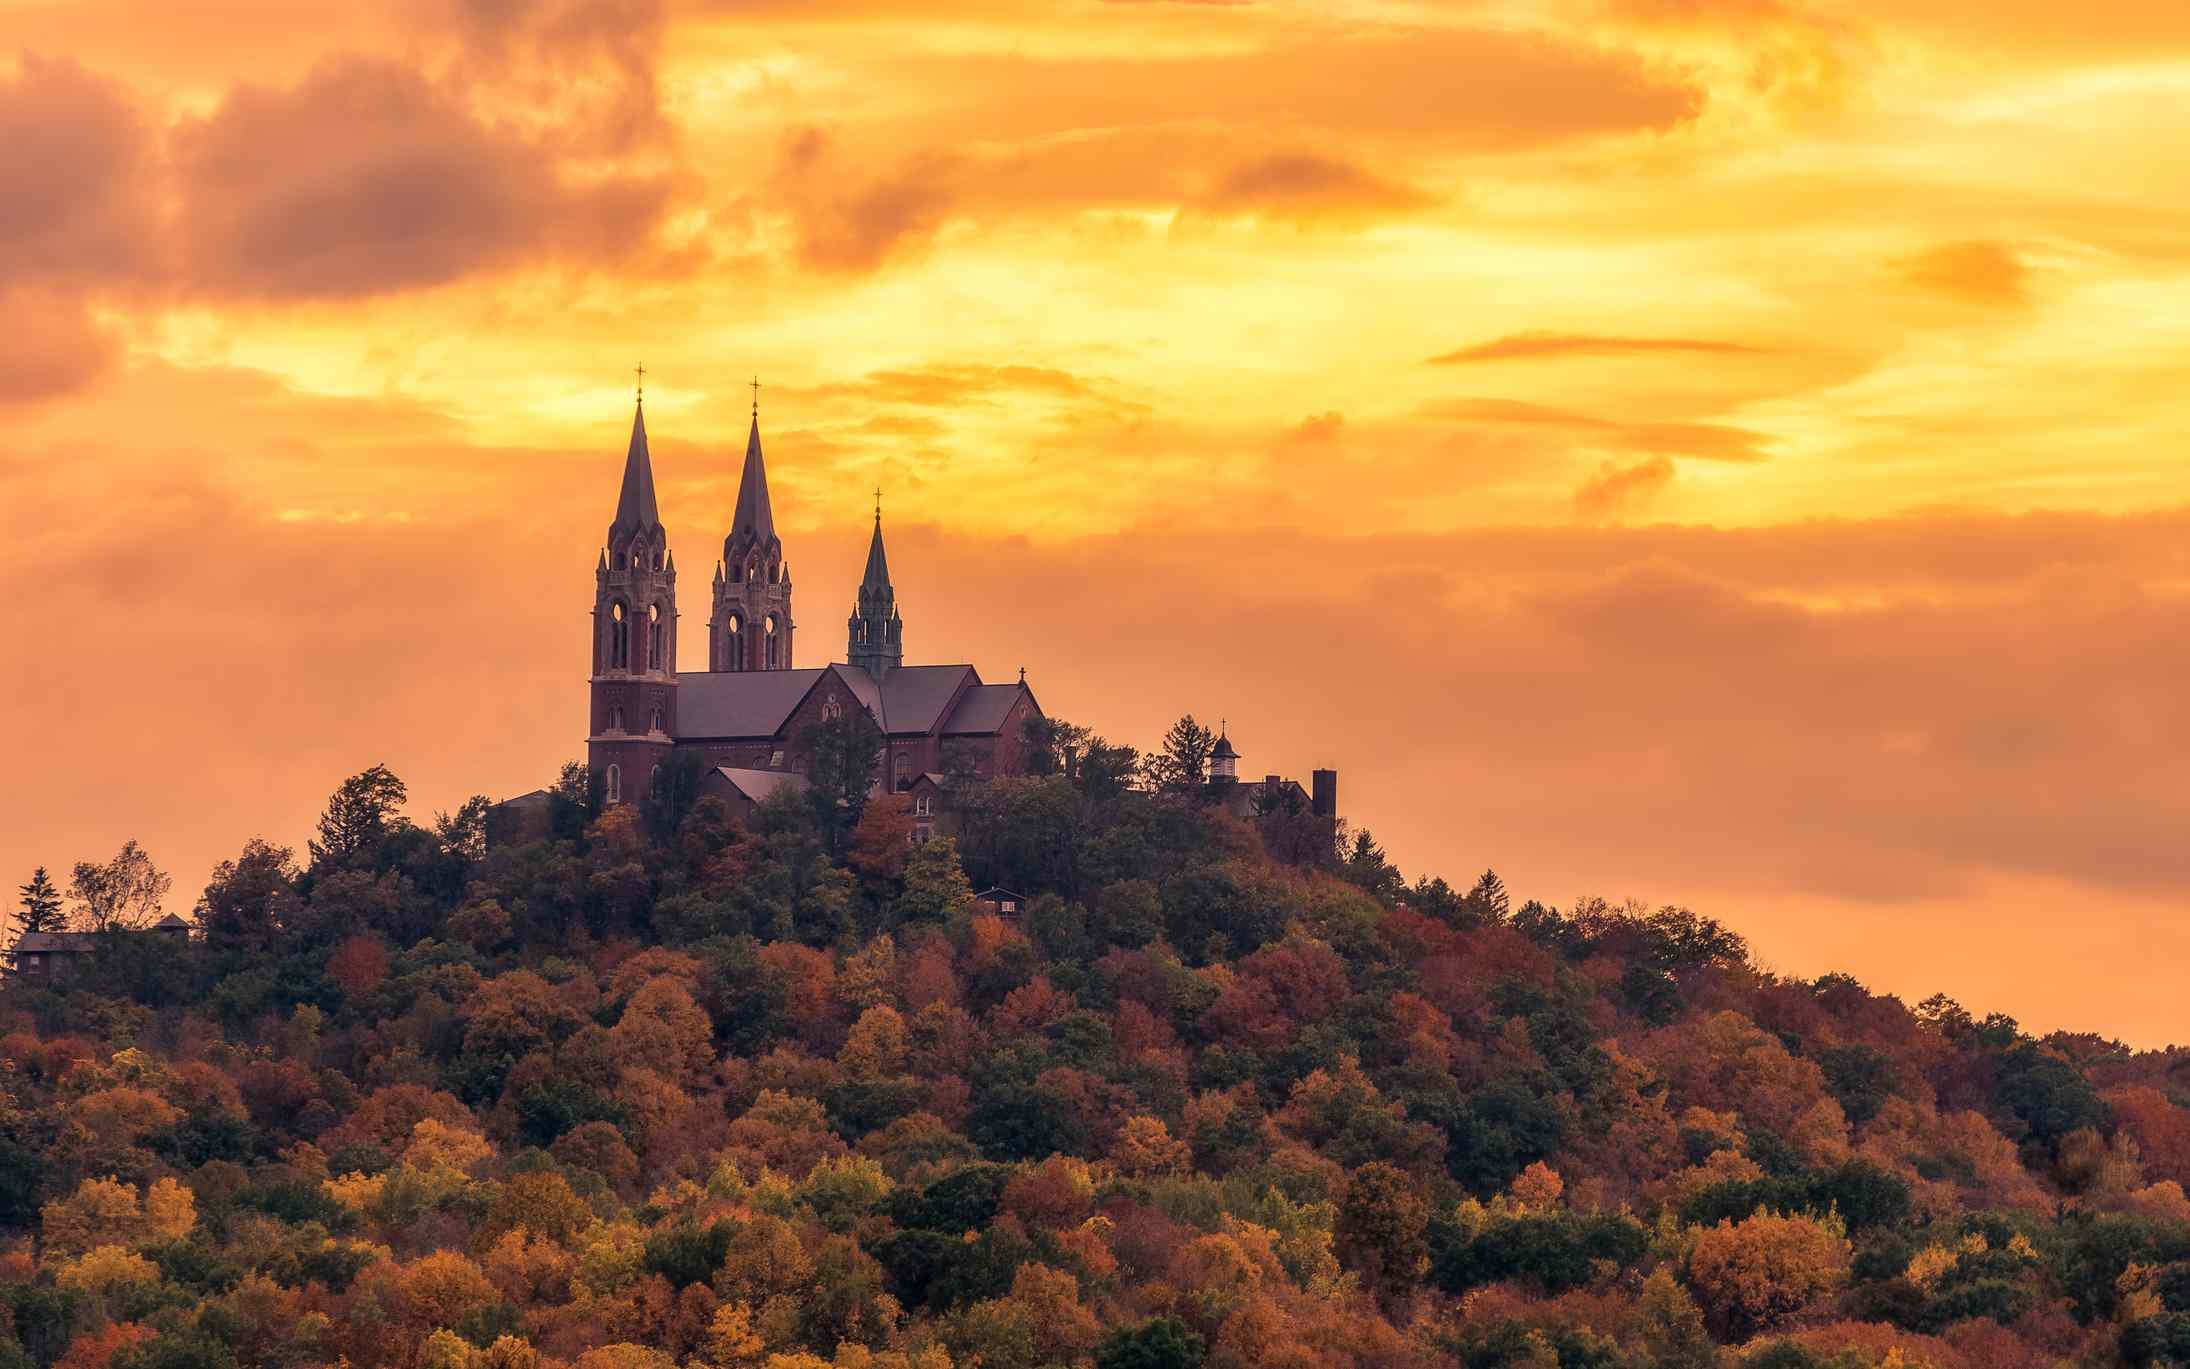 Holy Hill, Hubertus